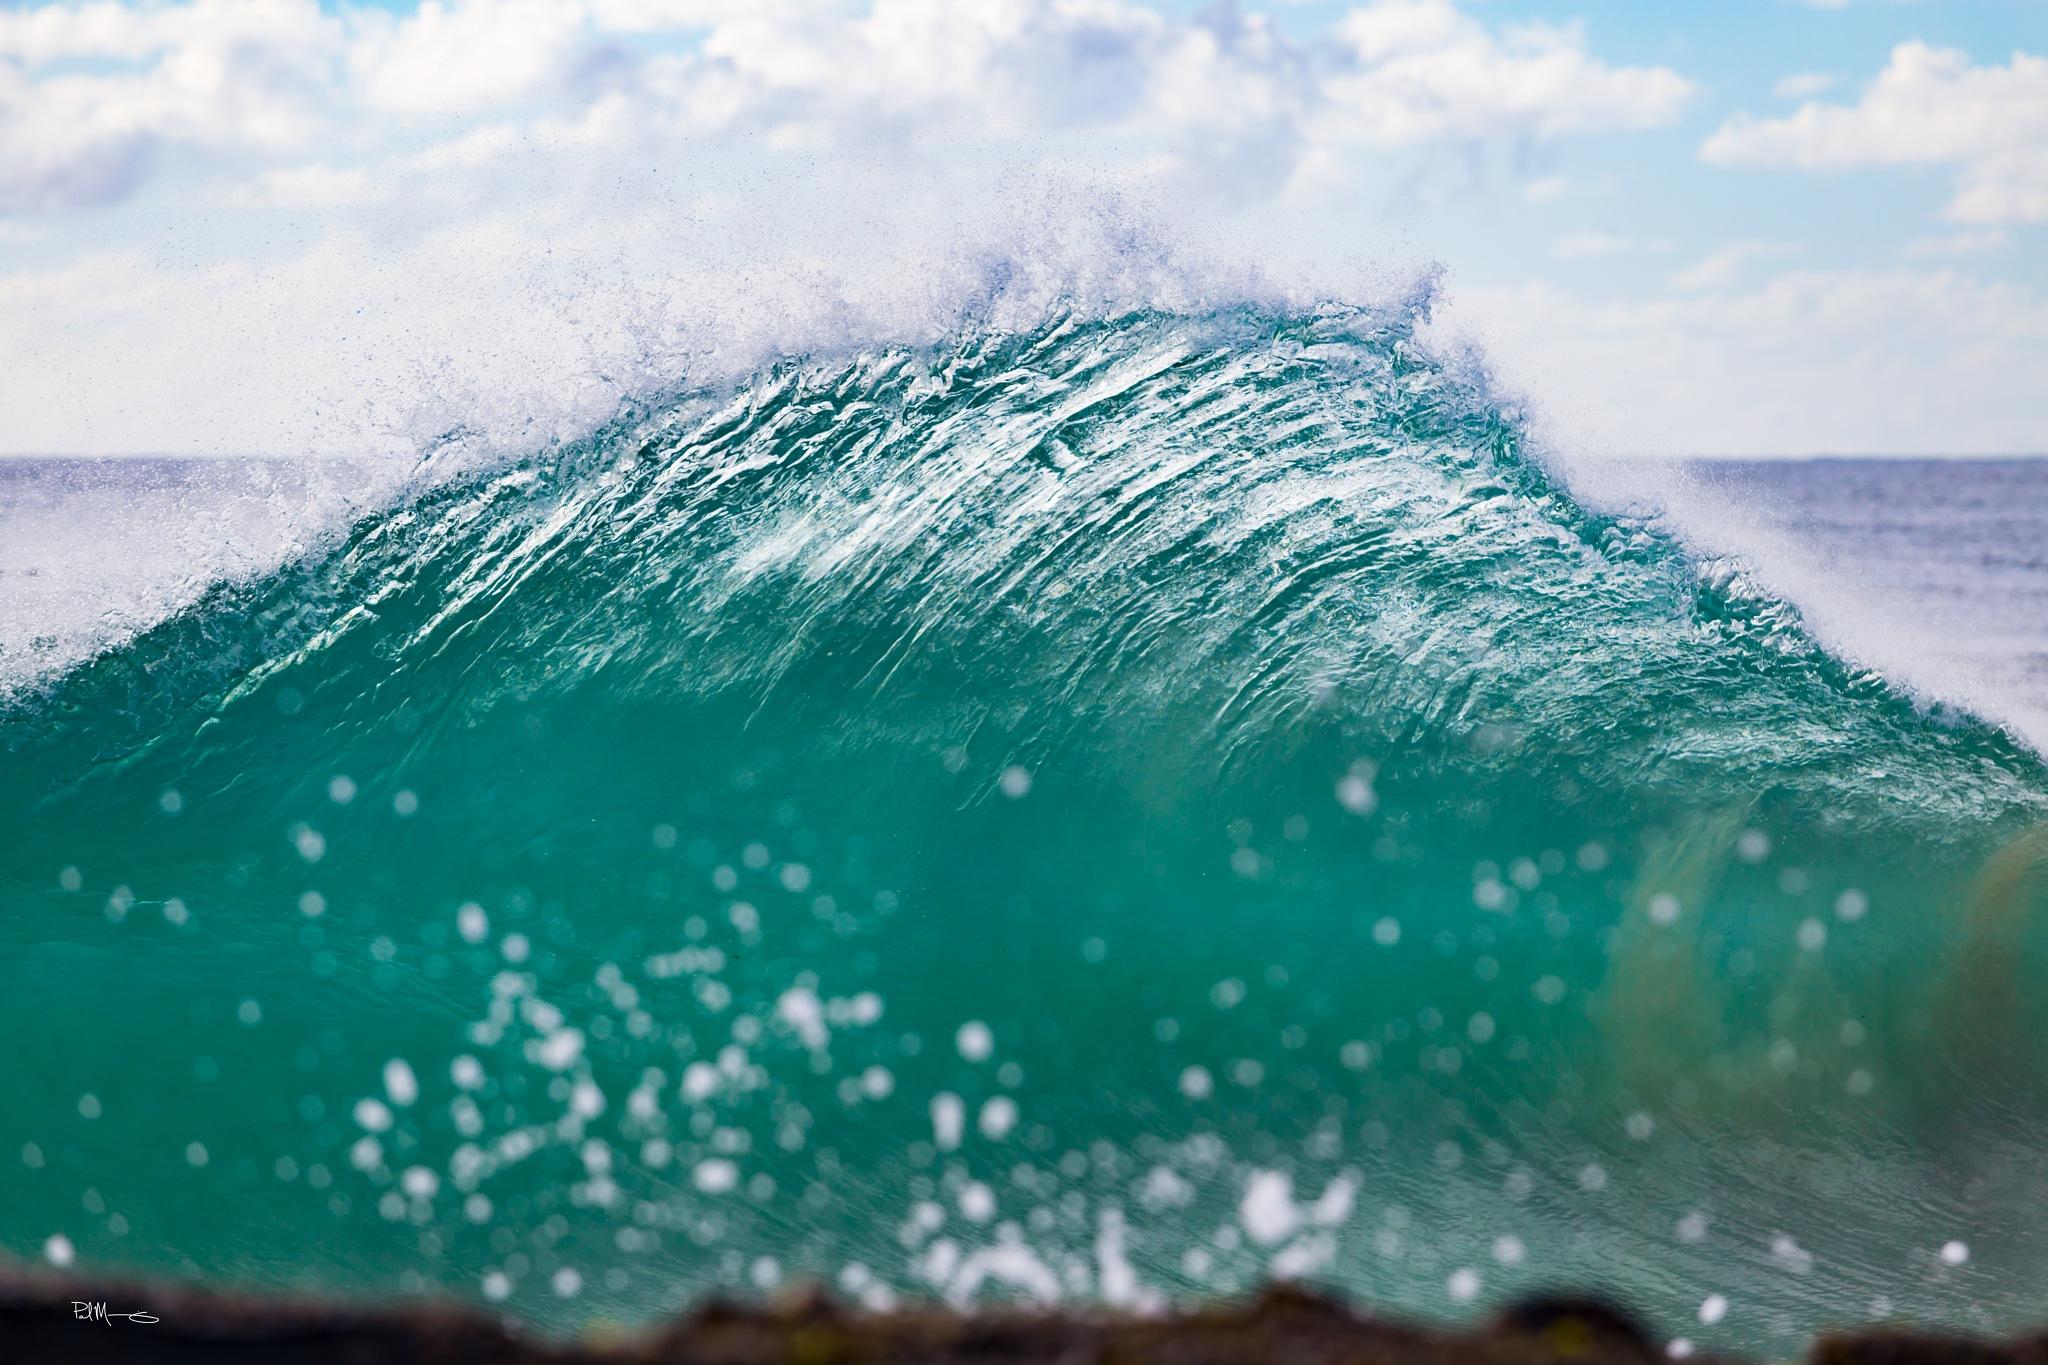 Water Wonder by Paul Manning